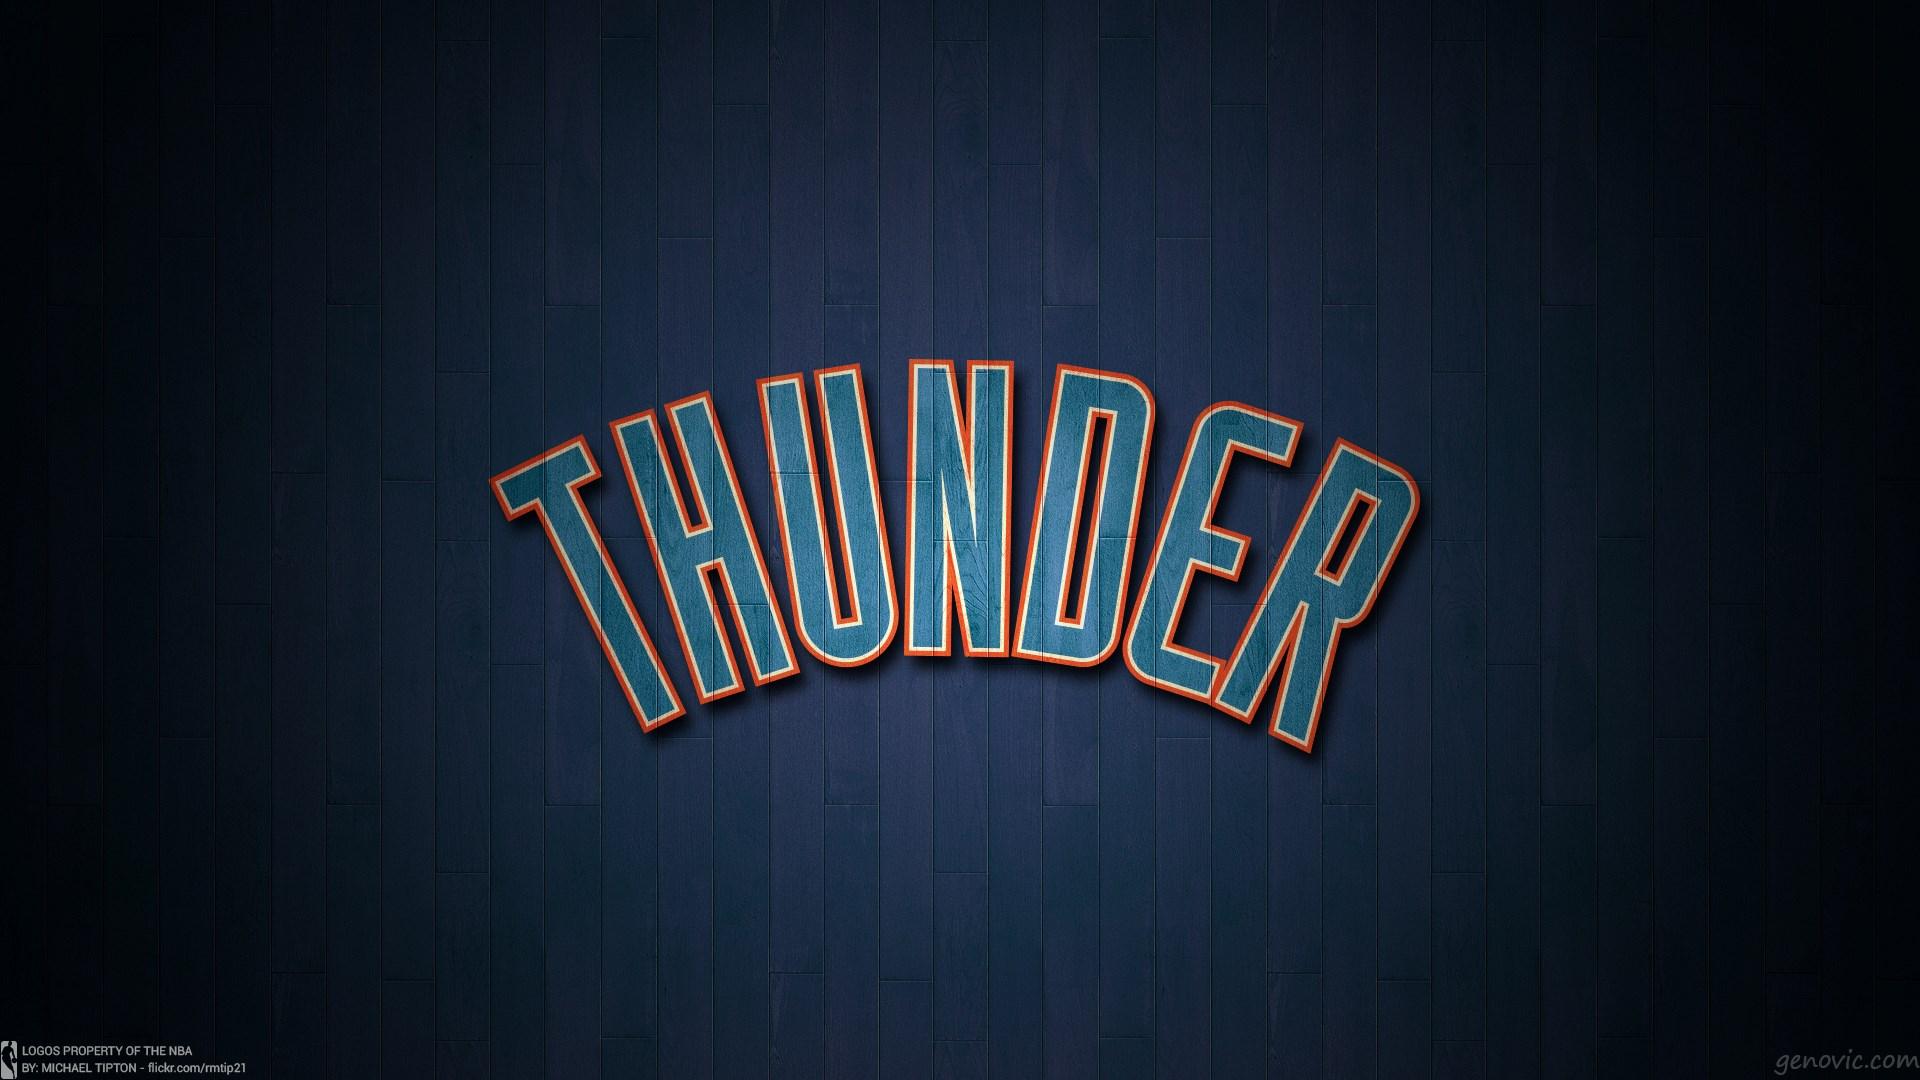 OKLAHOMA CITY THUNDER basketball nba g wallpaper 1920x1080 158391 1920x1080